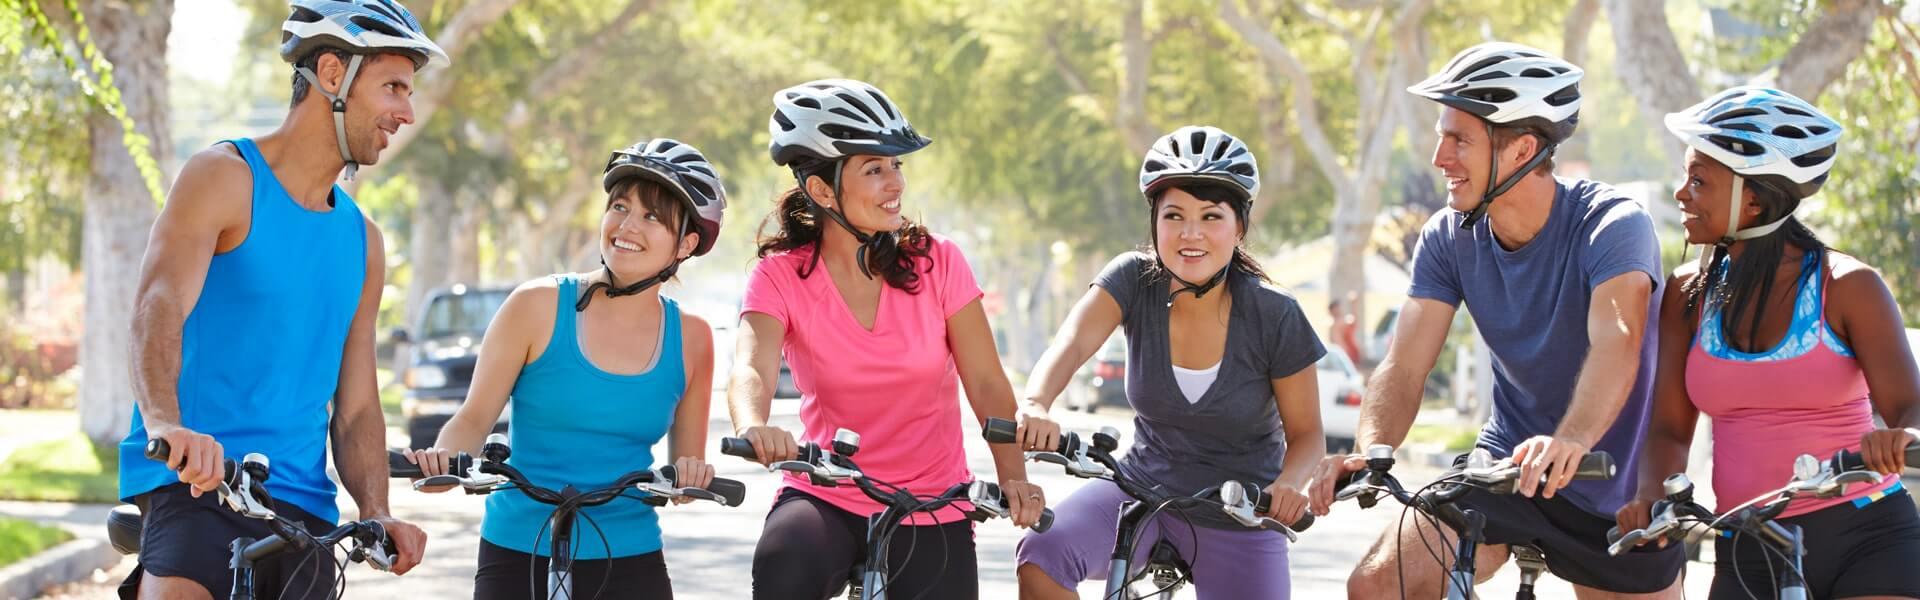 Fahrrad Schnitzeljagd mit Globe Chaser und b-ceed als outdoor Teambuilding Event